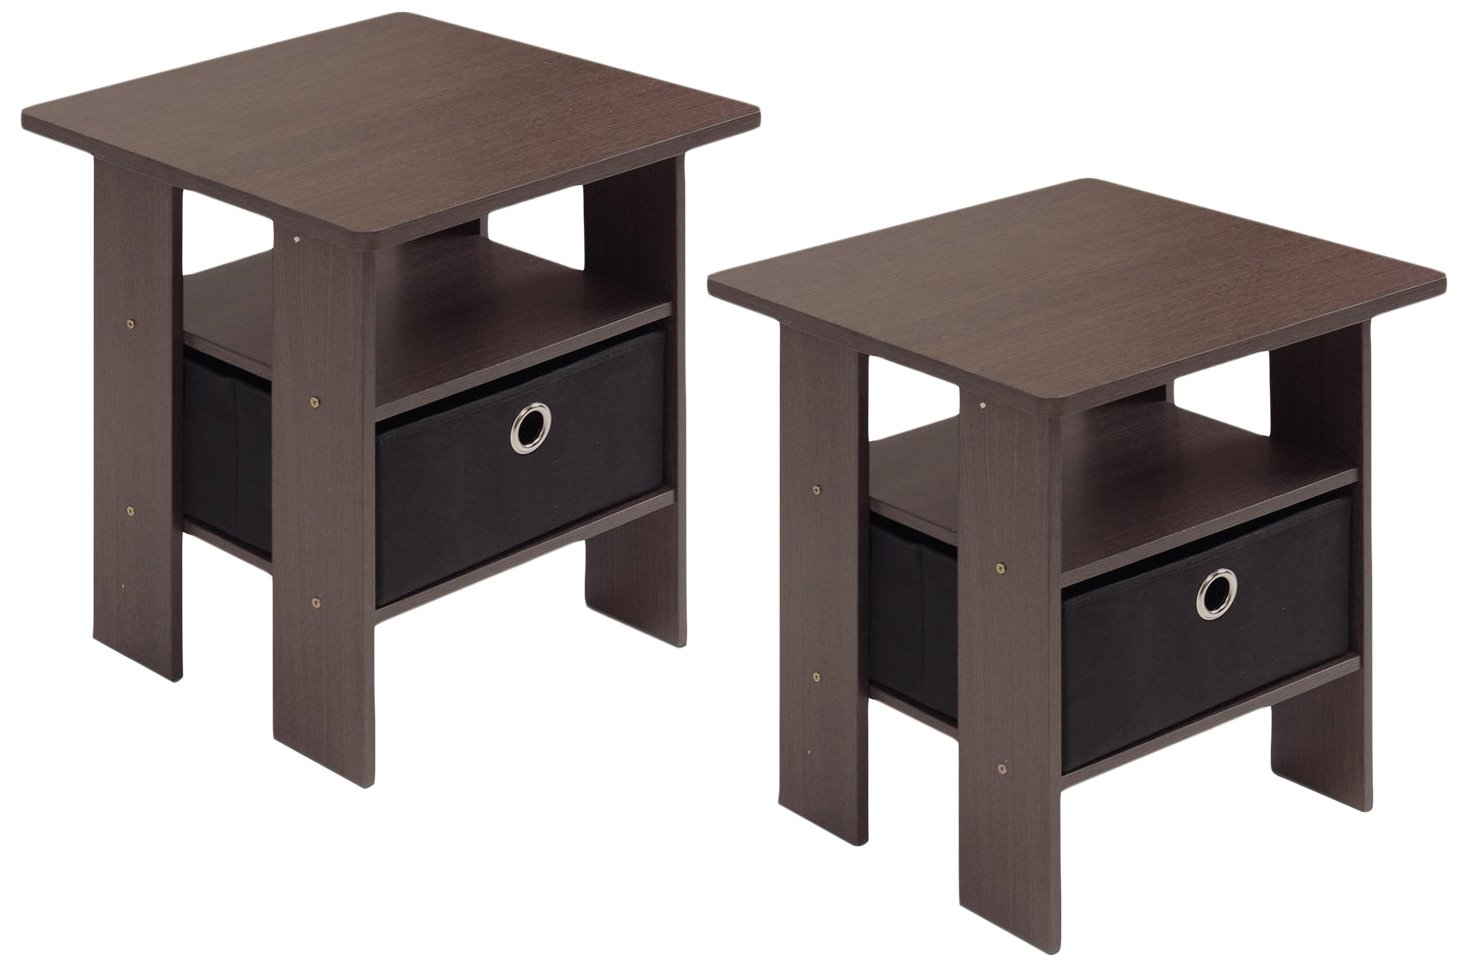 Furinno 2-11157DBR End Table Bedroom Night Stand, Petite, Dark Brown, Set of 2